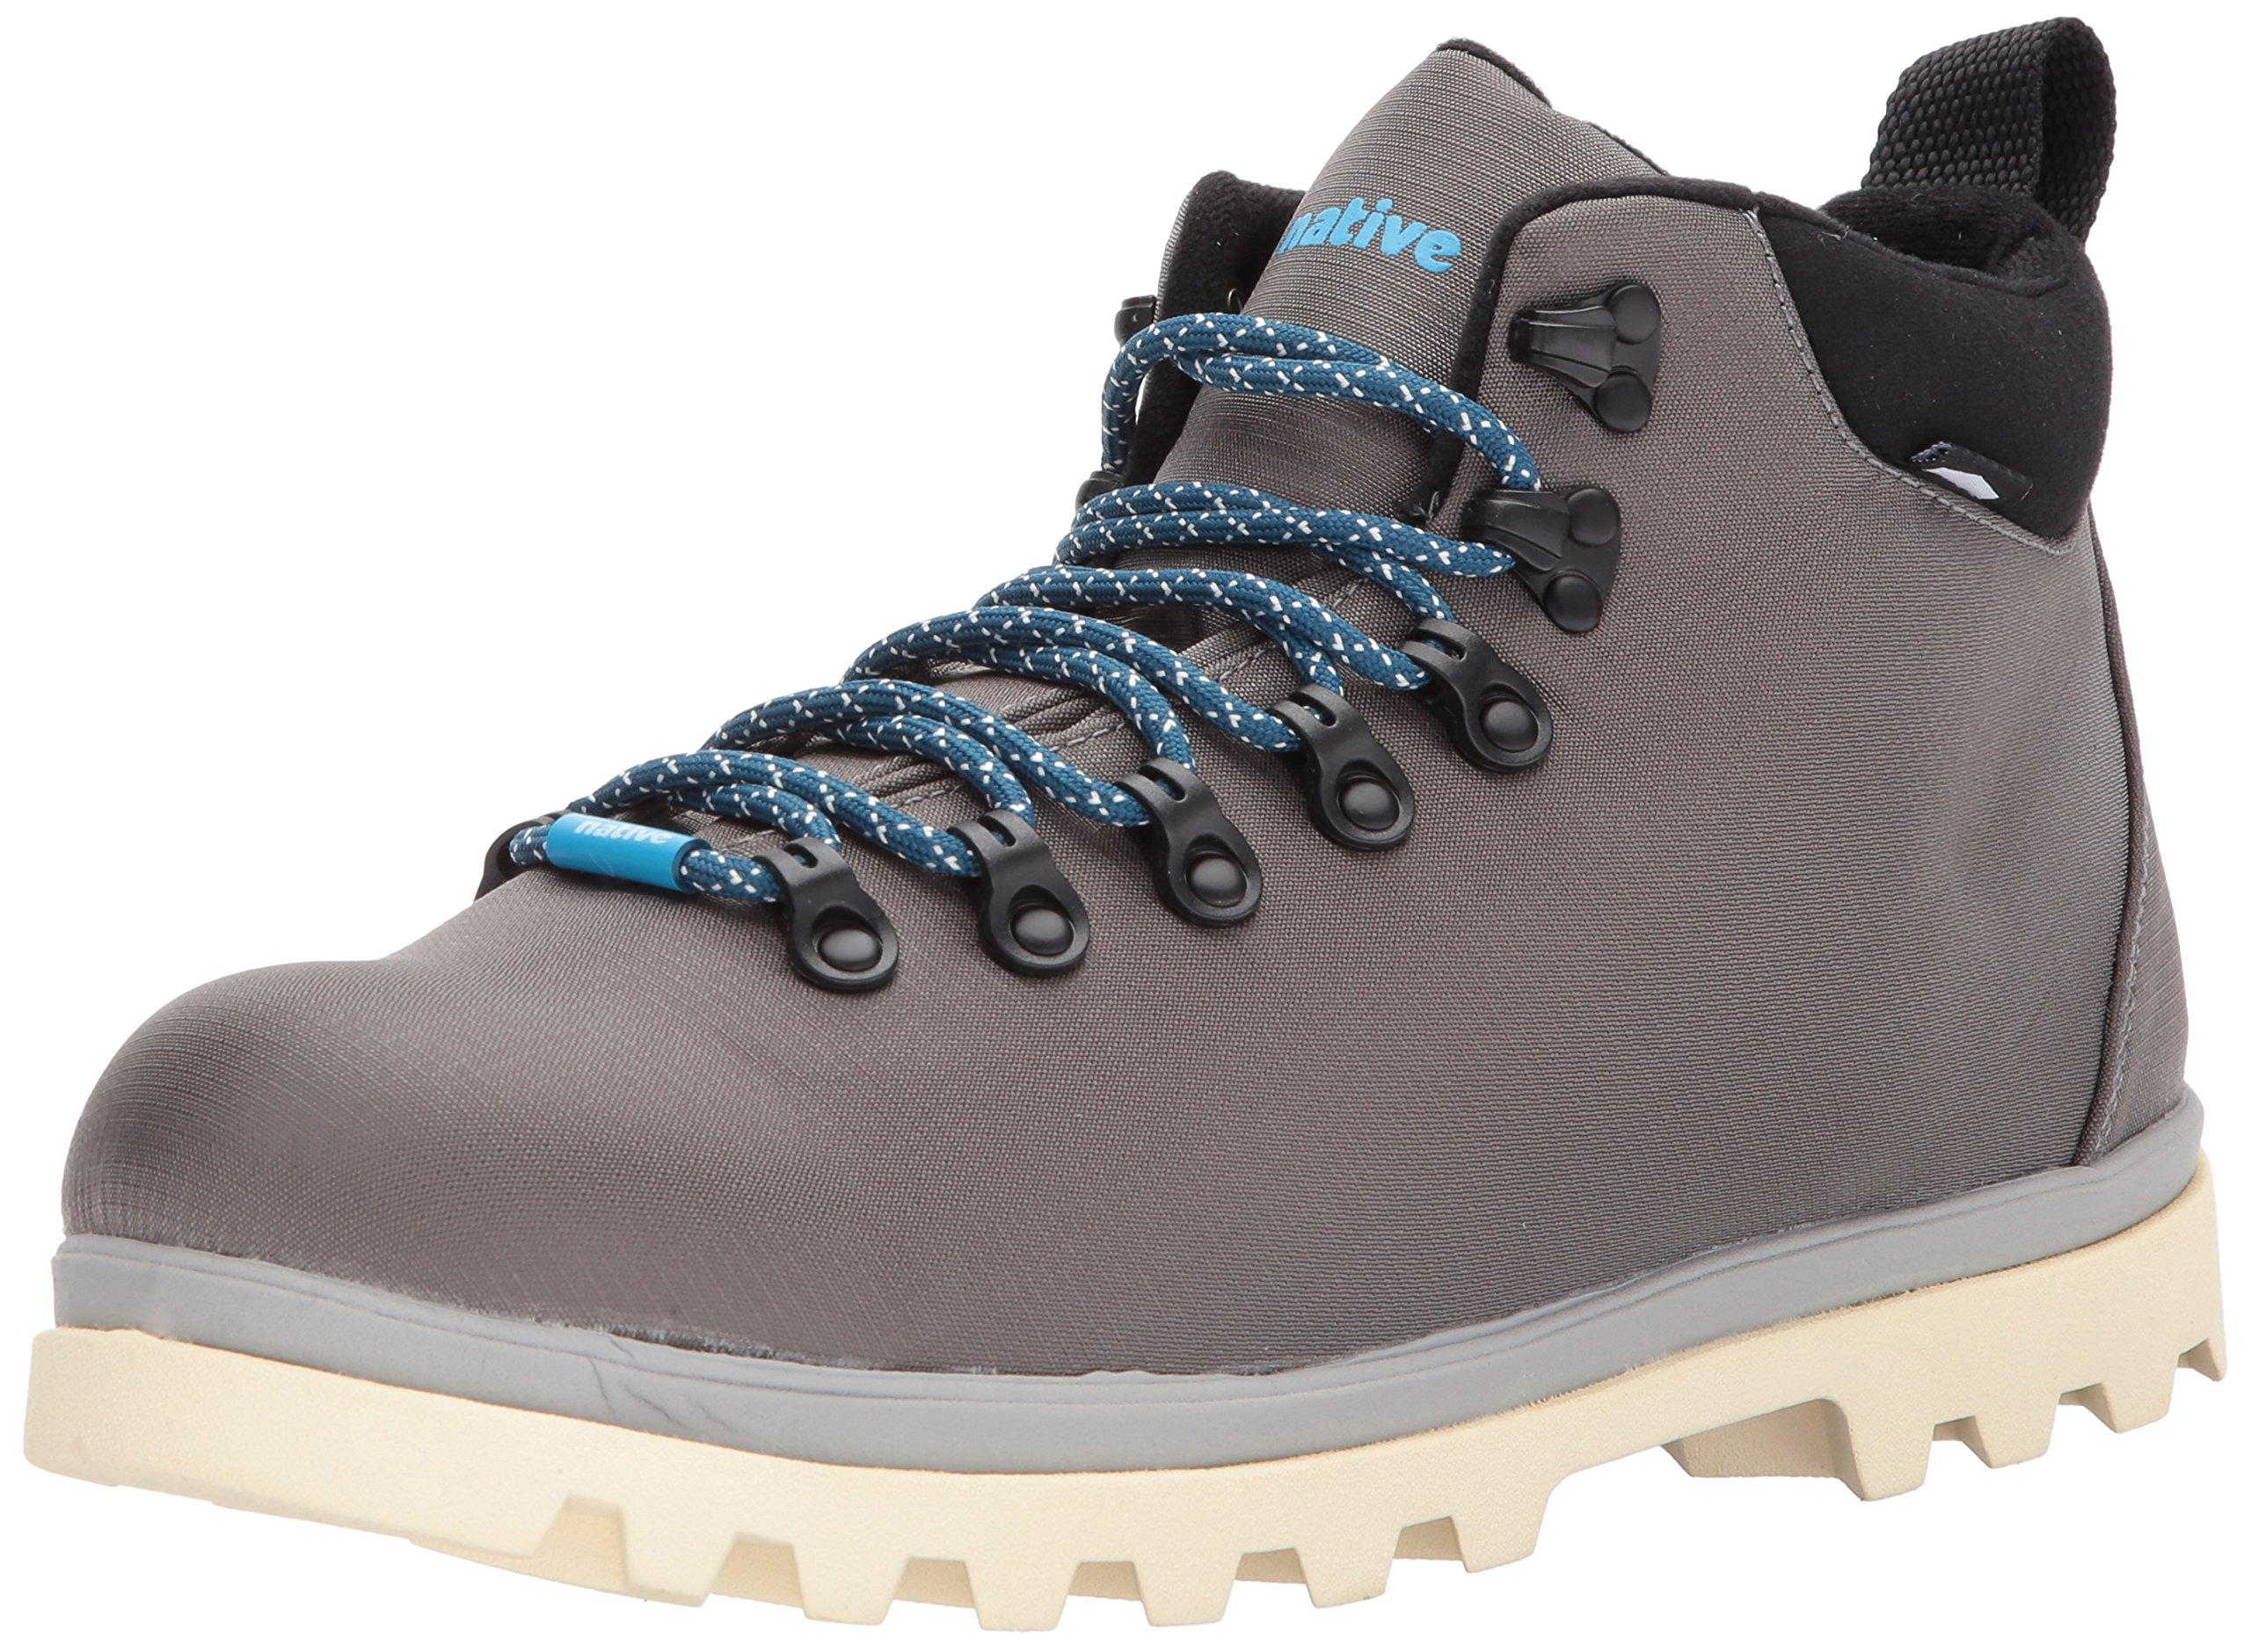 native Men's Fitzsimmons Treklite Rain Boot, Dublin Grey/Pigeon Grey/Bone White, 10 M US